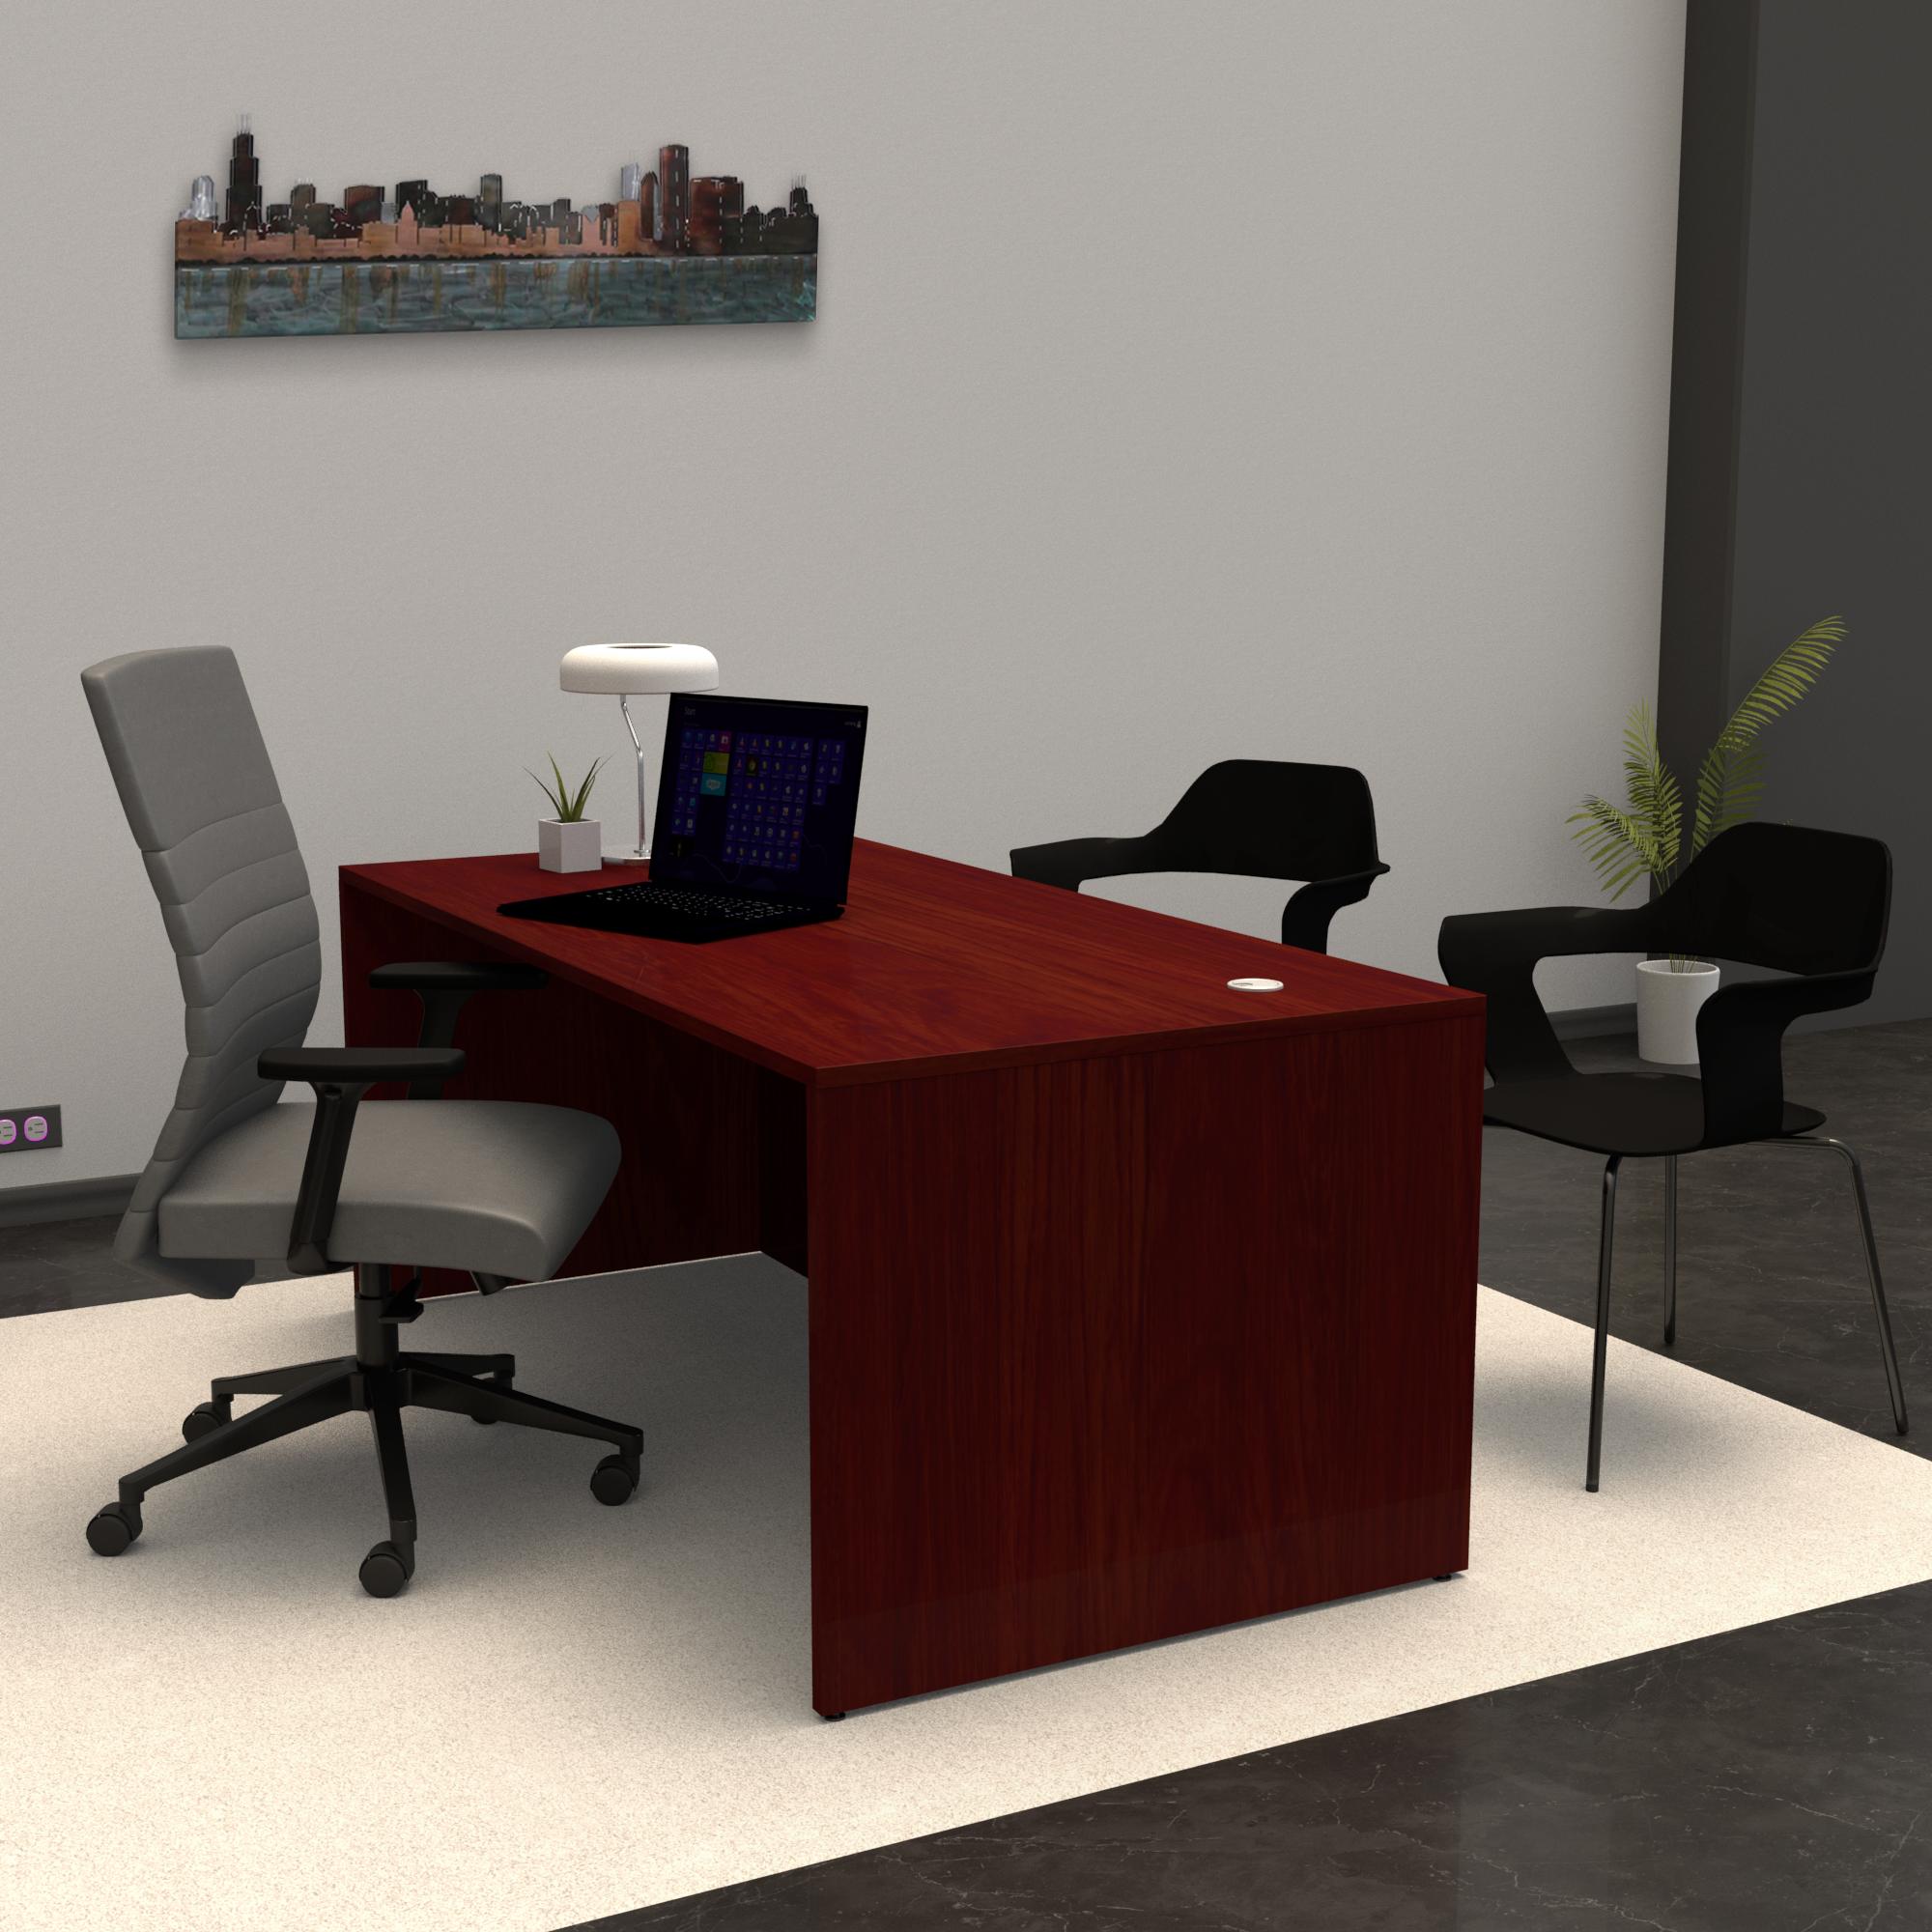 Pivit Full Panel Desk (American Cherry) | MaximLT Task Seating (Anchor) | Bardot Guest Chair (Vamp)